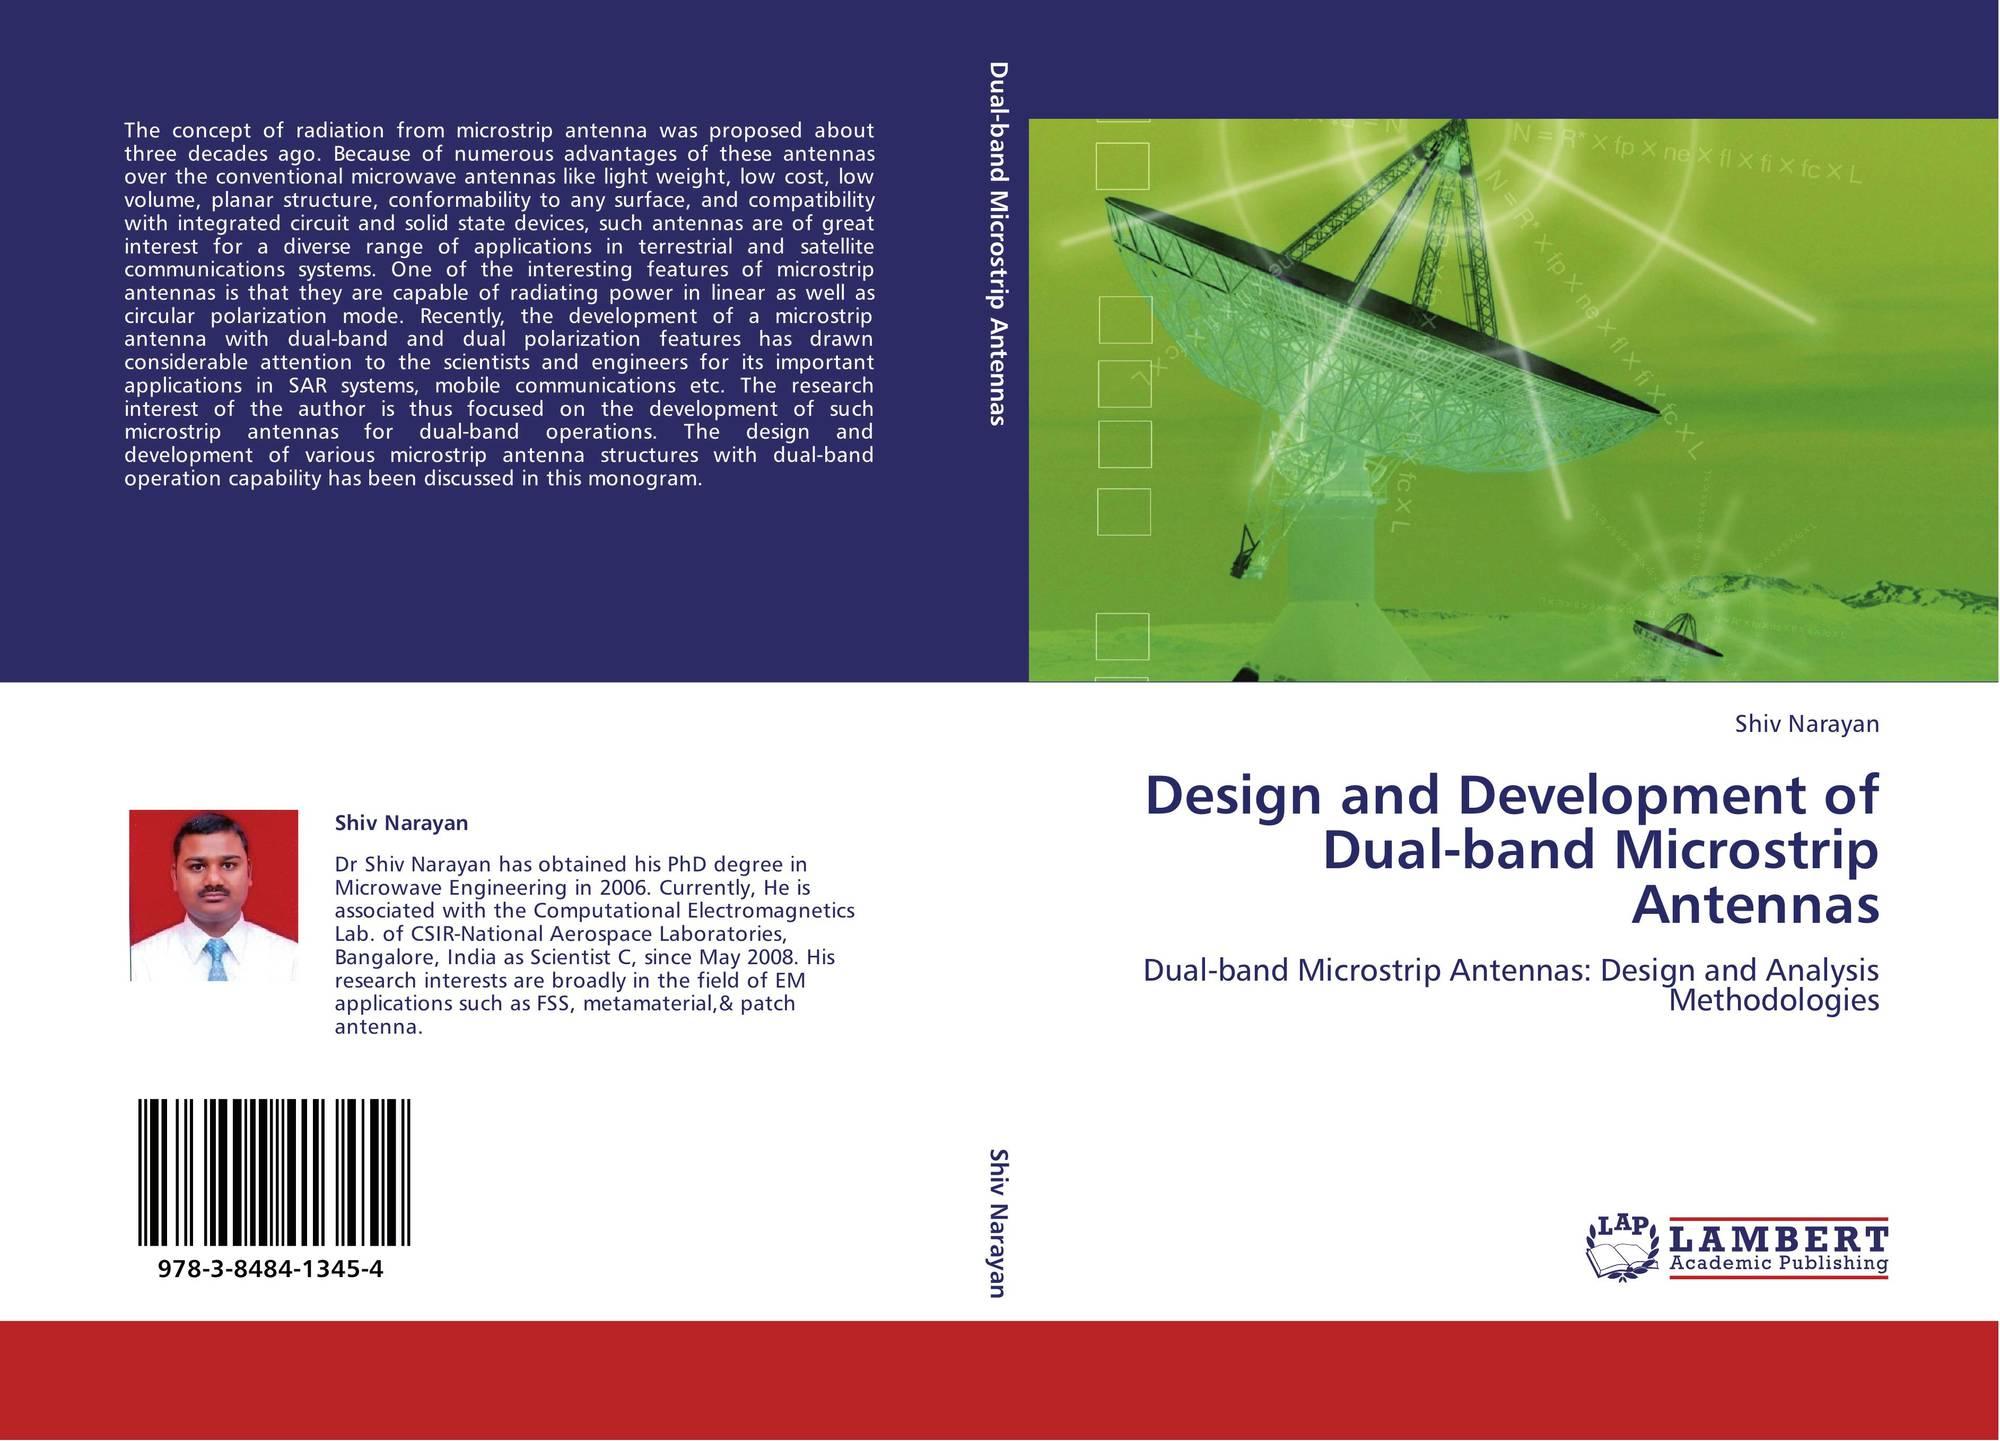 Design and Development of Dual-band Microstrip Antennas, 978-3-8484